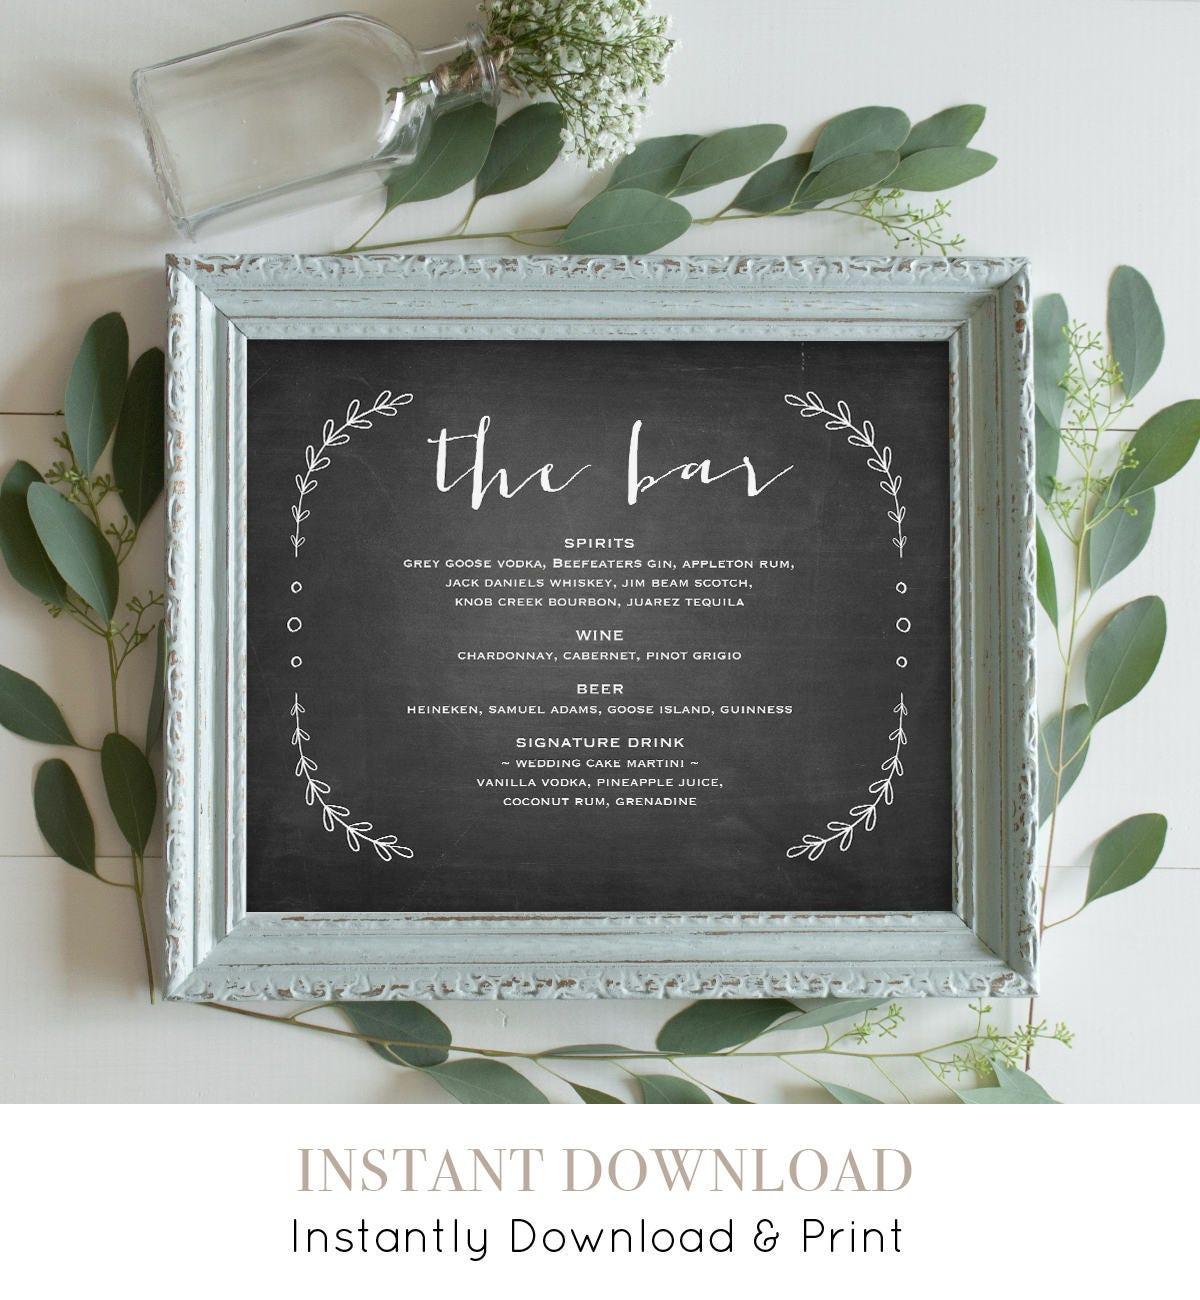 Bar Menu Sign Template Printable Wedding Cocktail Drink Editable Text Chalkboard Rustic Laurels Instant Download VC17